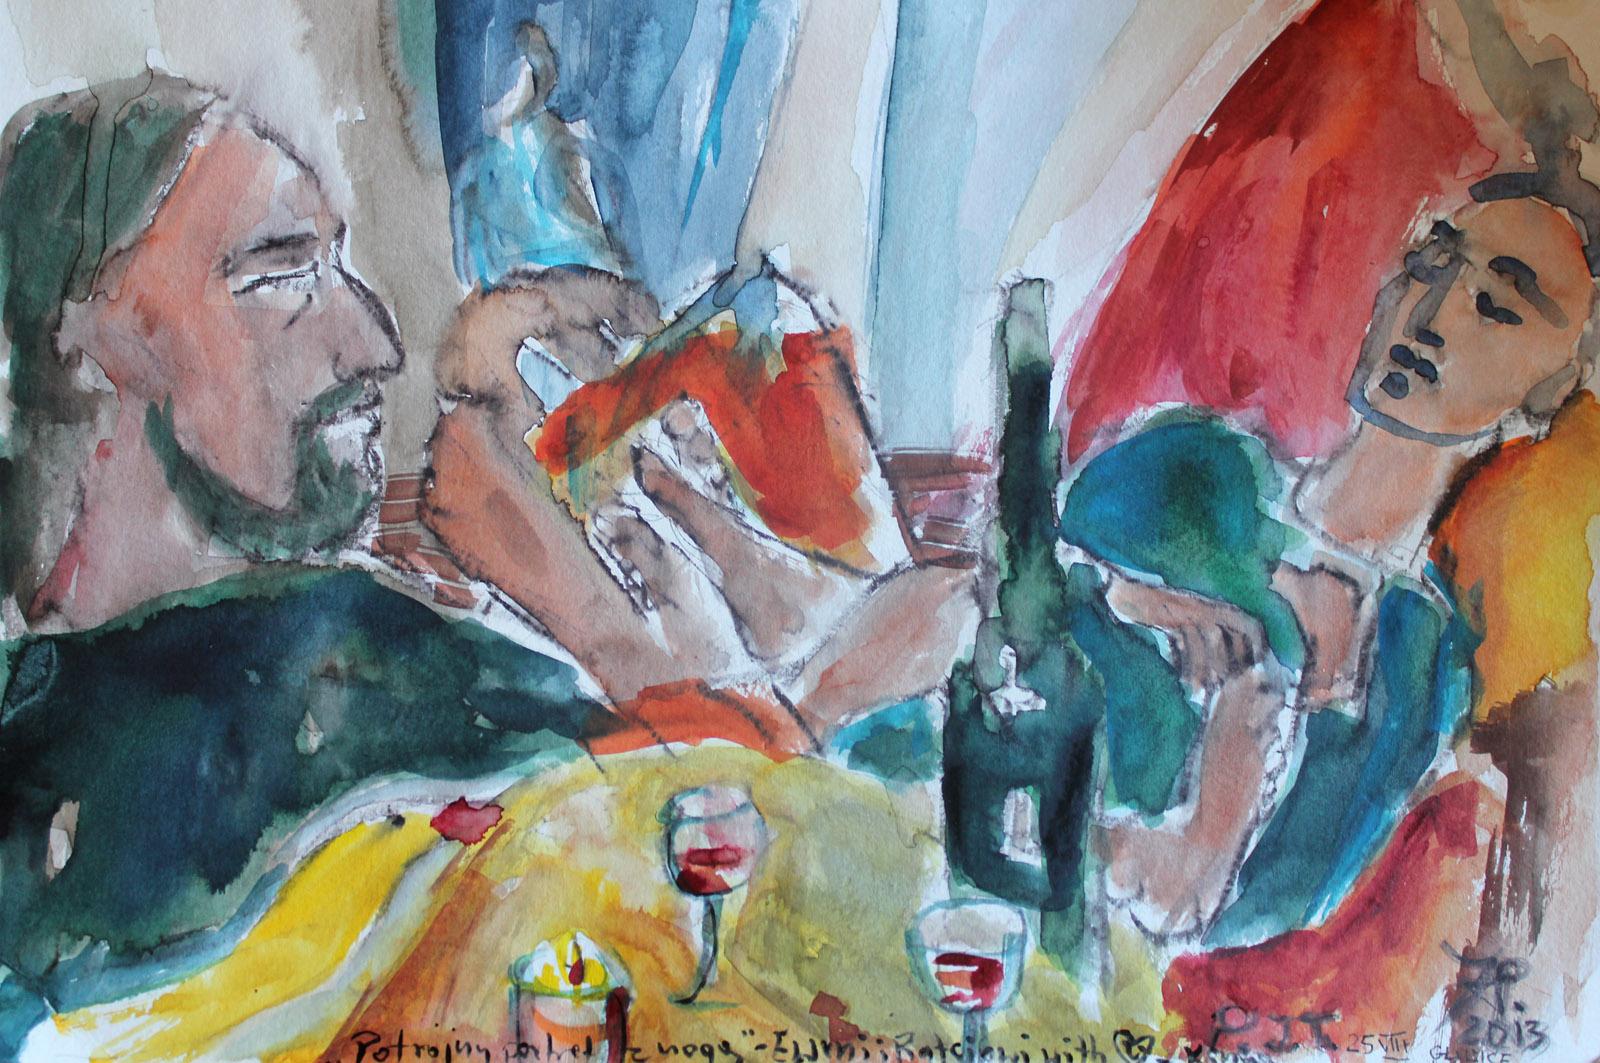 Potrójny portret z nogą - akwarela